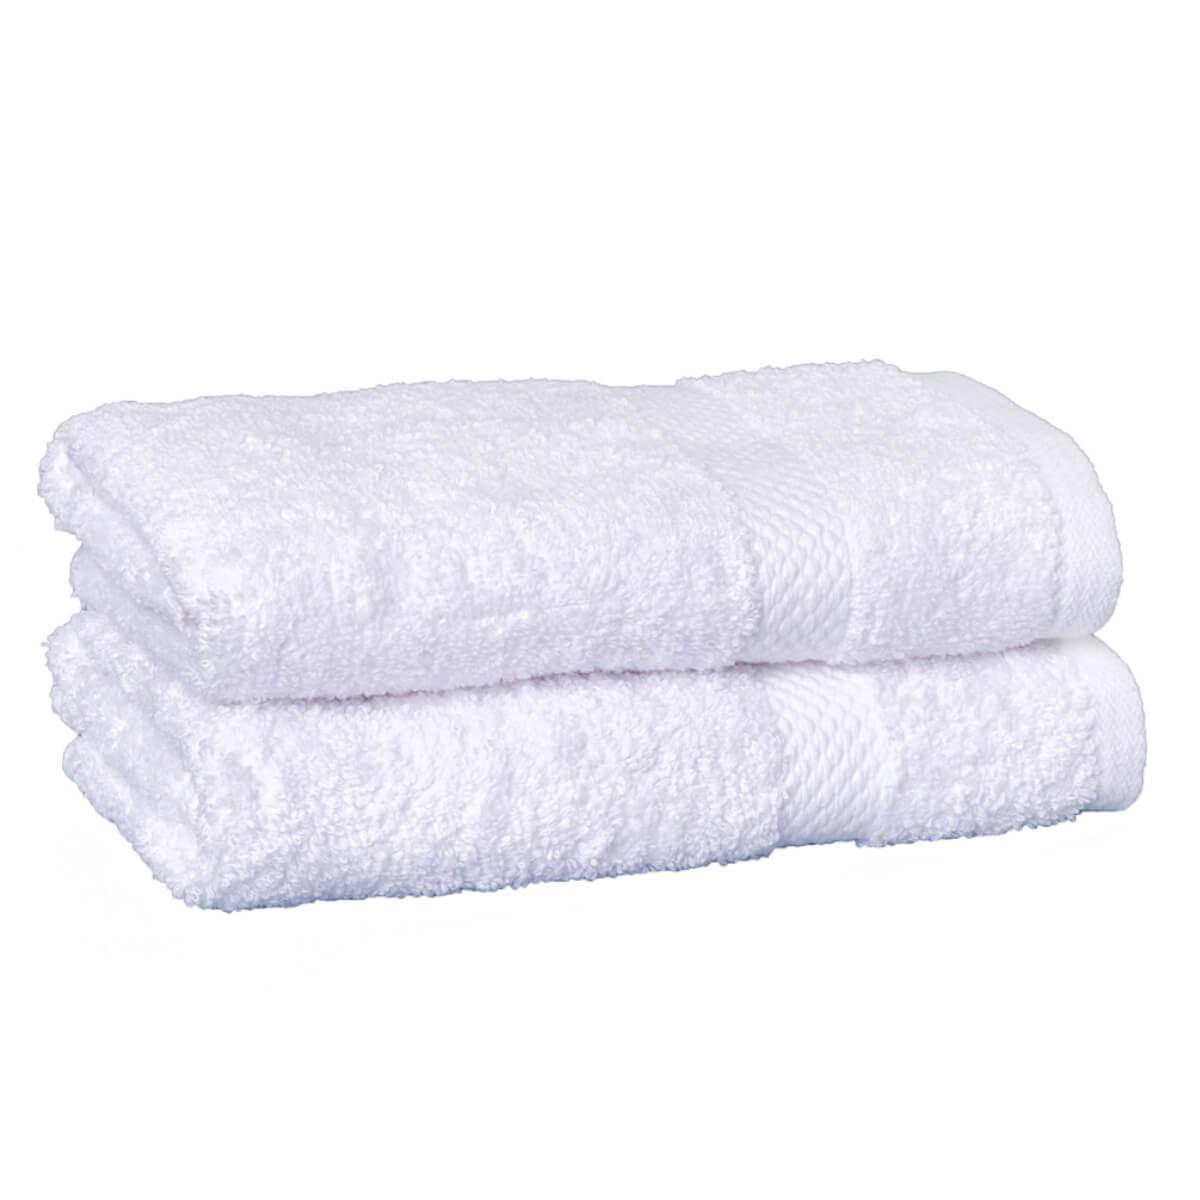 https://www.linenplus.ca/breezetm-100-egyptian-cotton-hand-towel-16-x-30-white-dobby-border.html